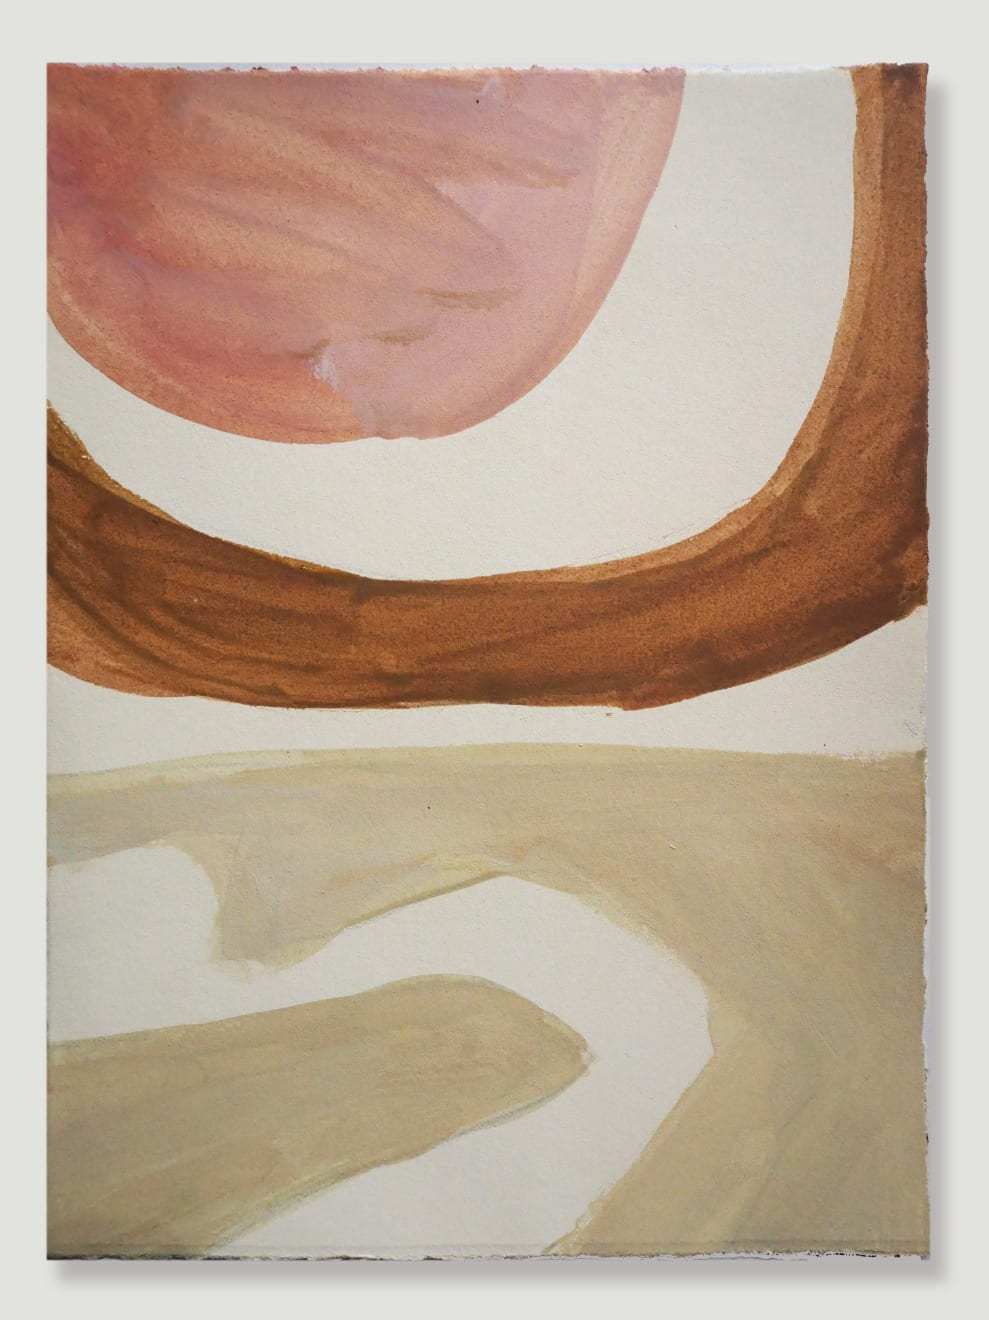 Caroline Popham, Path, 2020